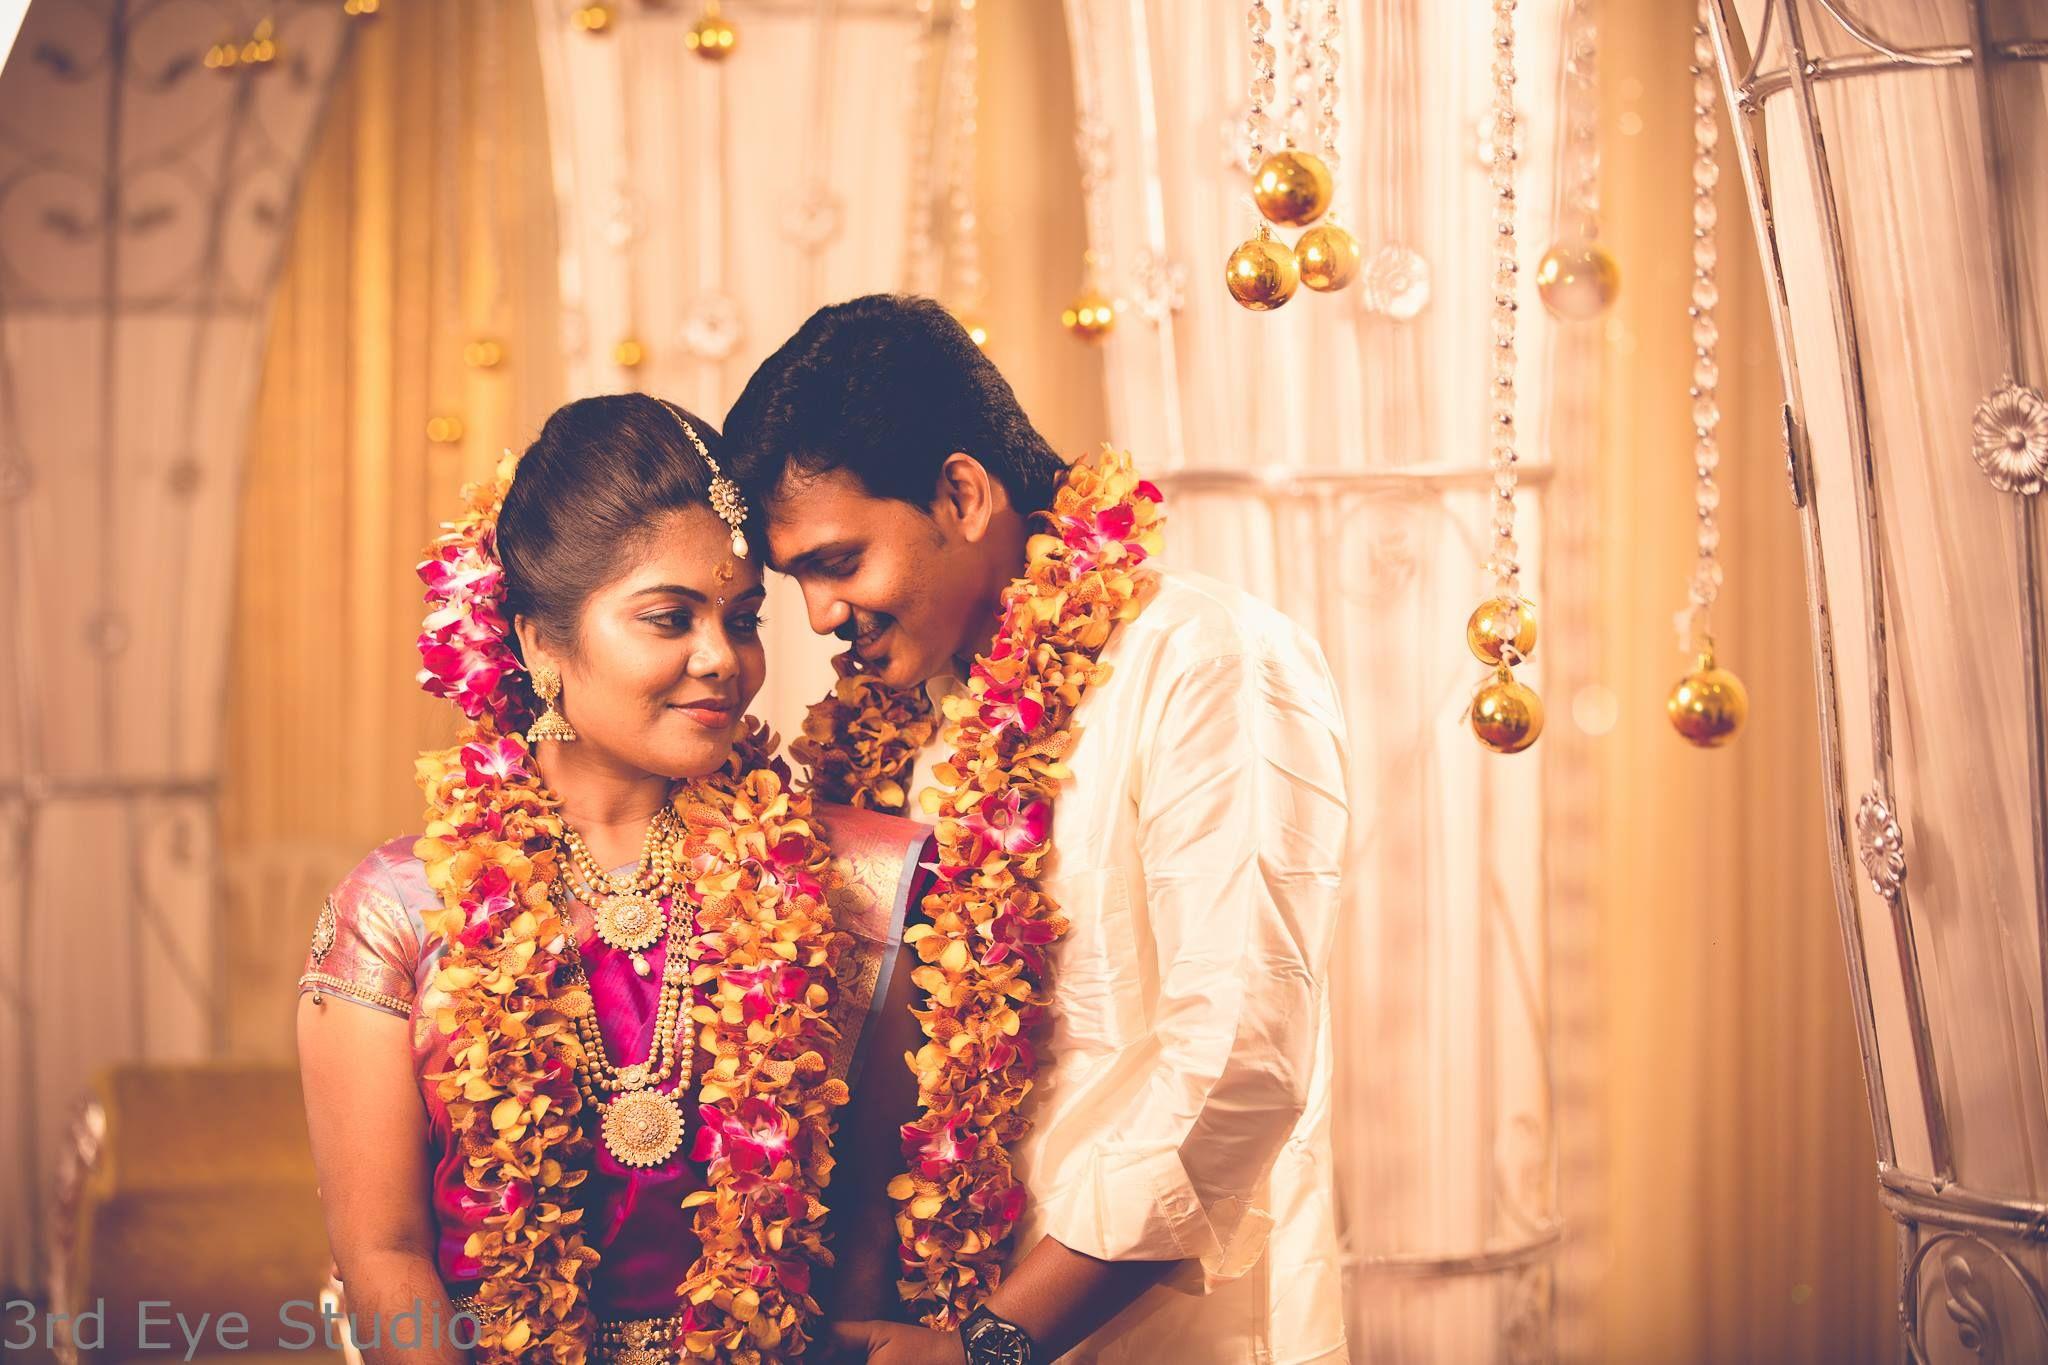 Pink With Golden Orchid Flower Wedding Garland Indian Wedding Garland Garland Wedding Orchid Wedding